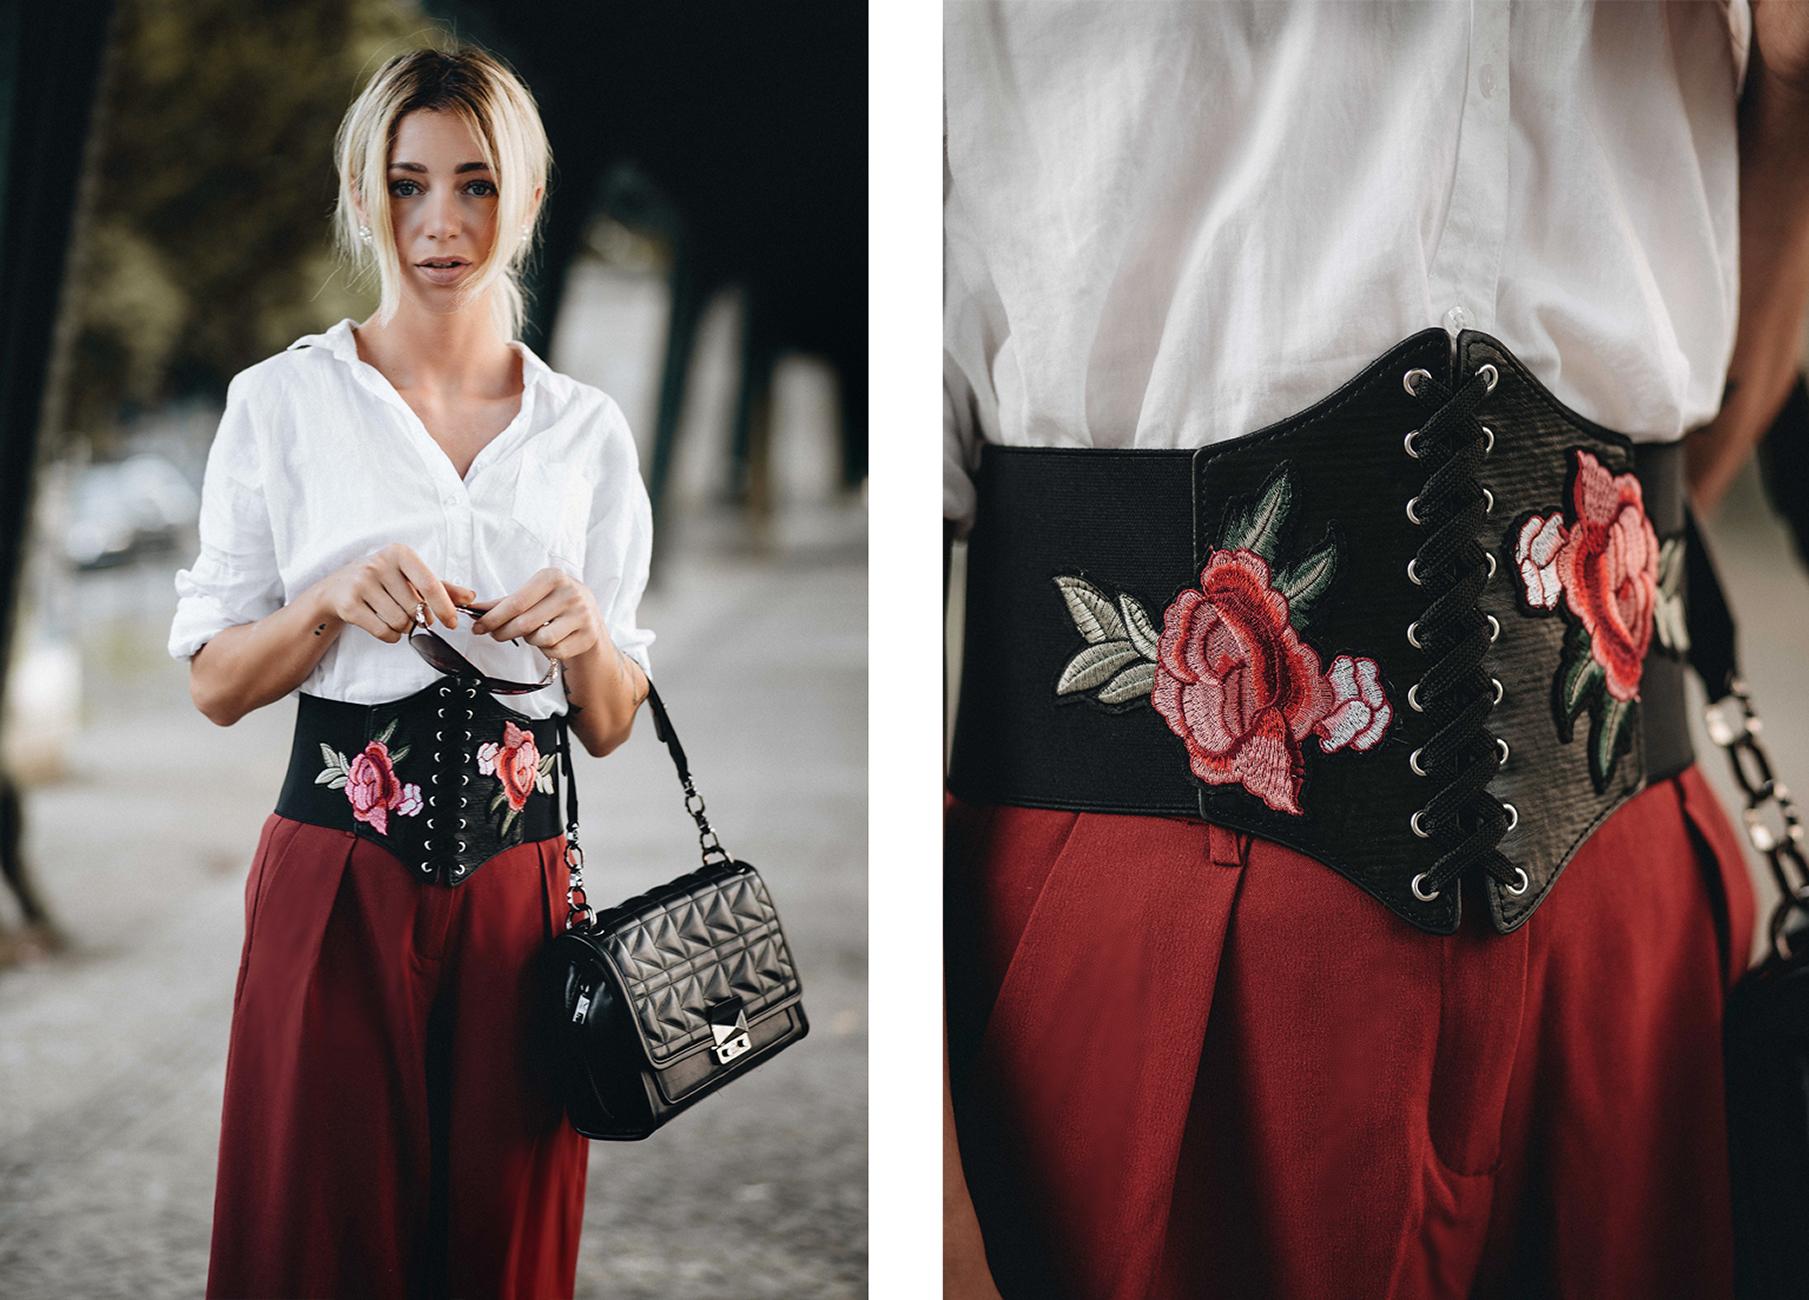 influencer-blogger-fashionblog-modeblog-koeln-instagram-style